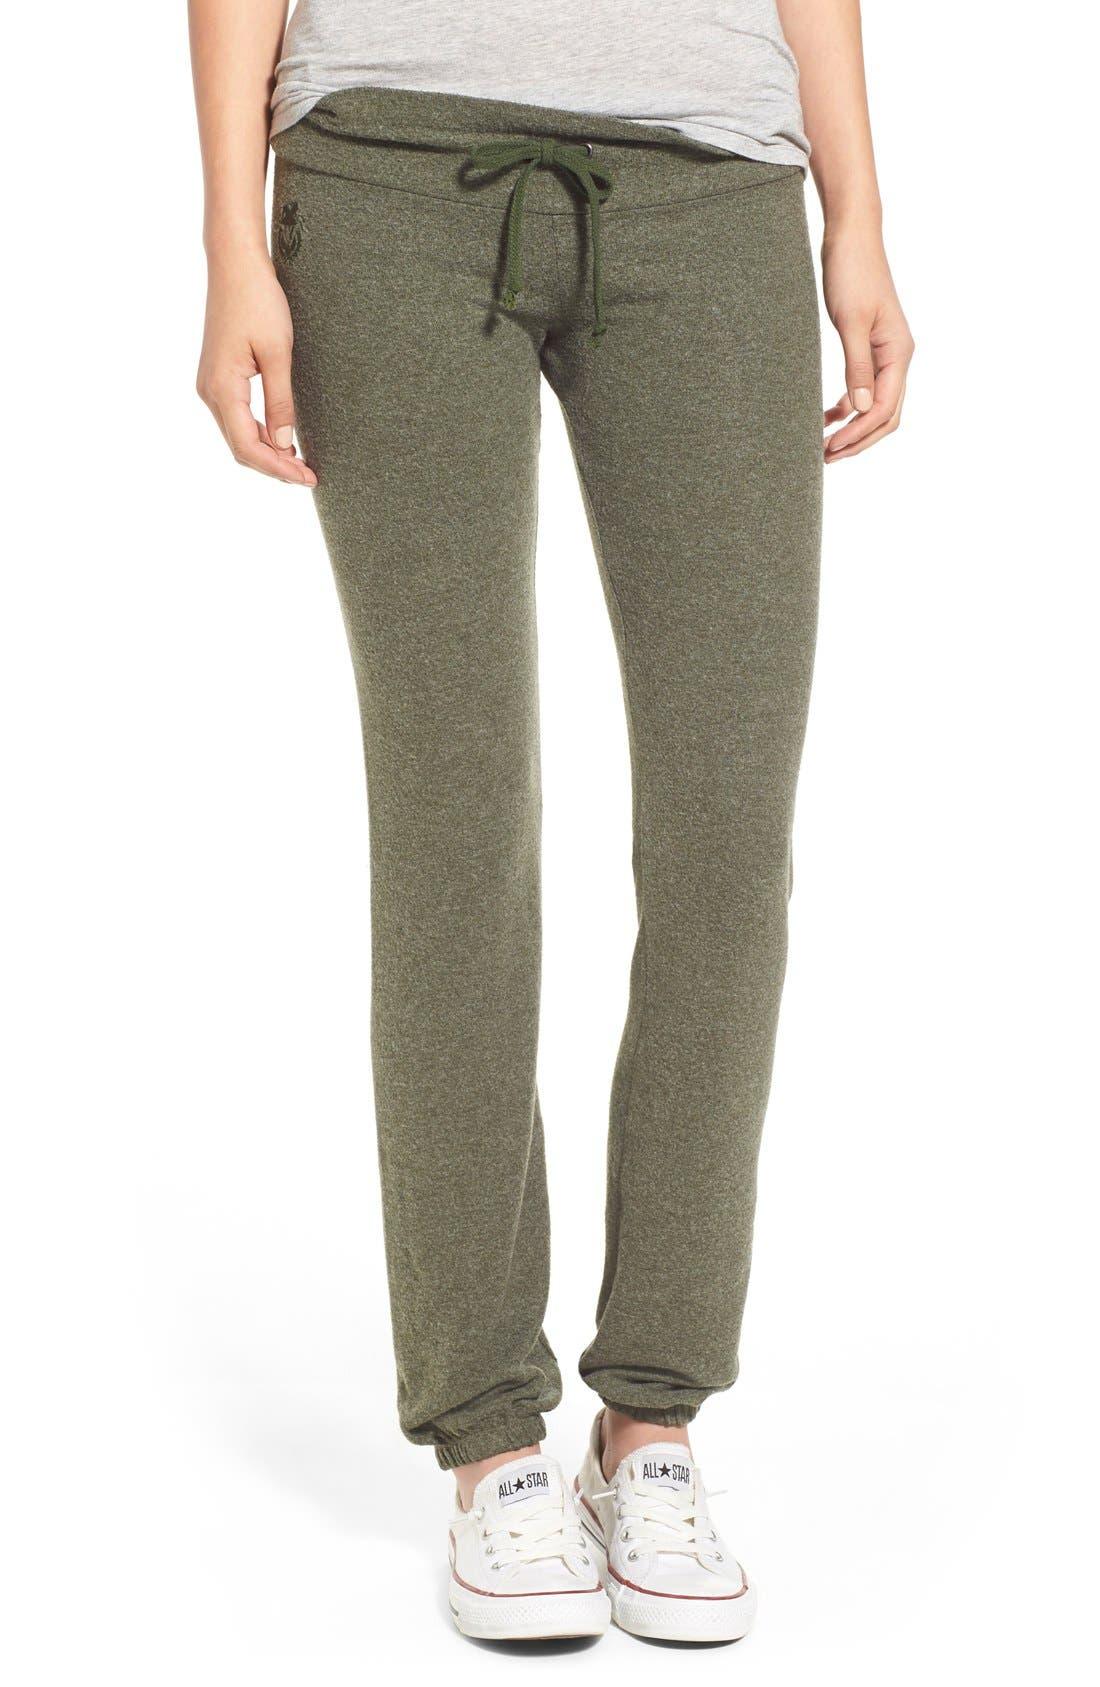 Alternate Image 1 Selected - Wildfox 'Basics - Malibu' Skinny Jogging Pants